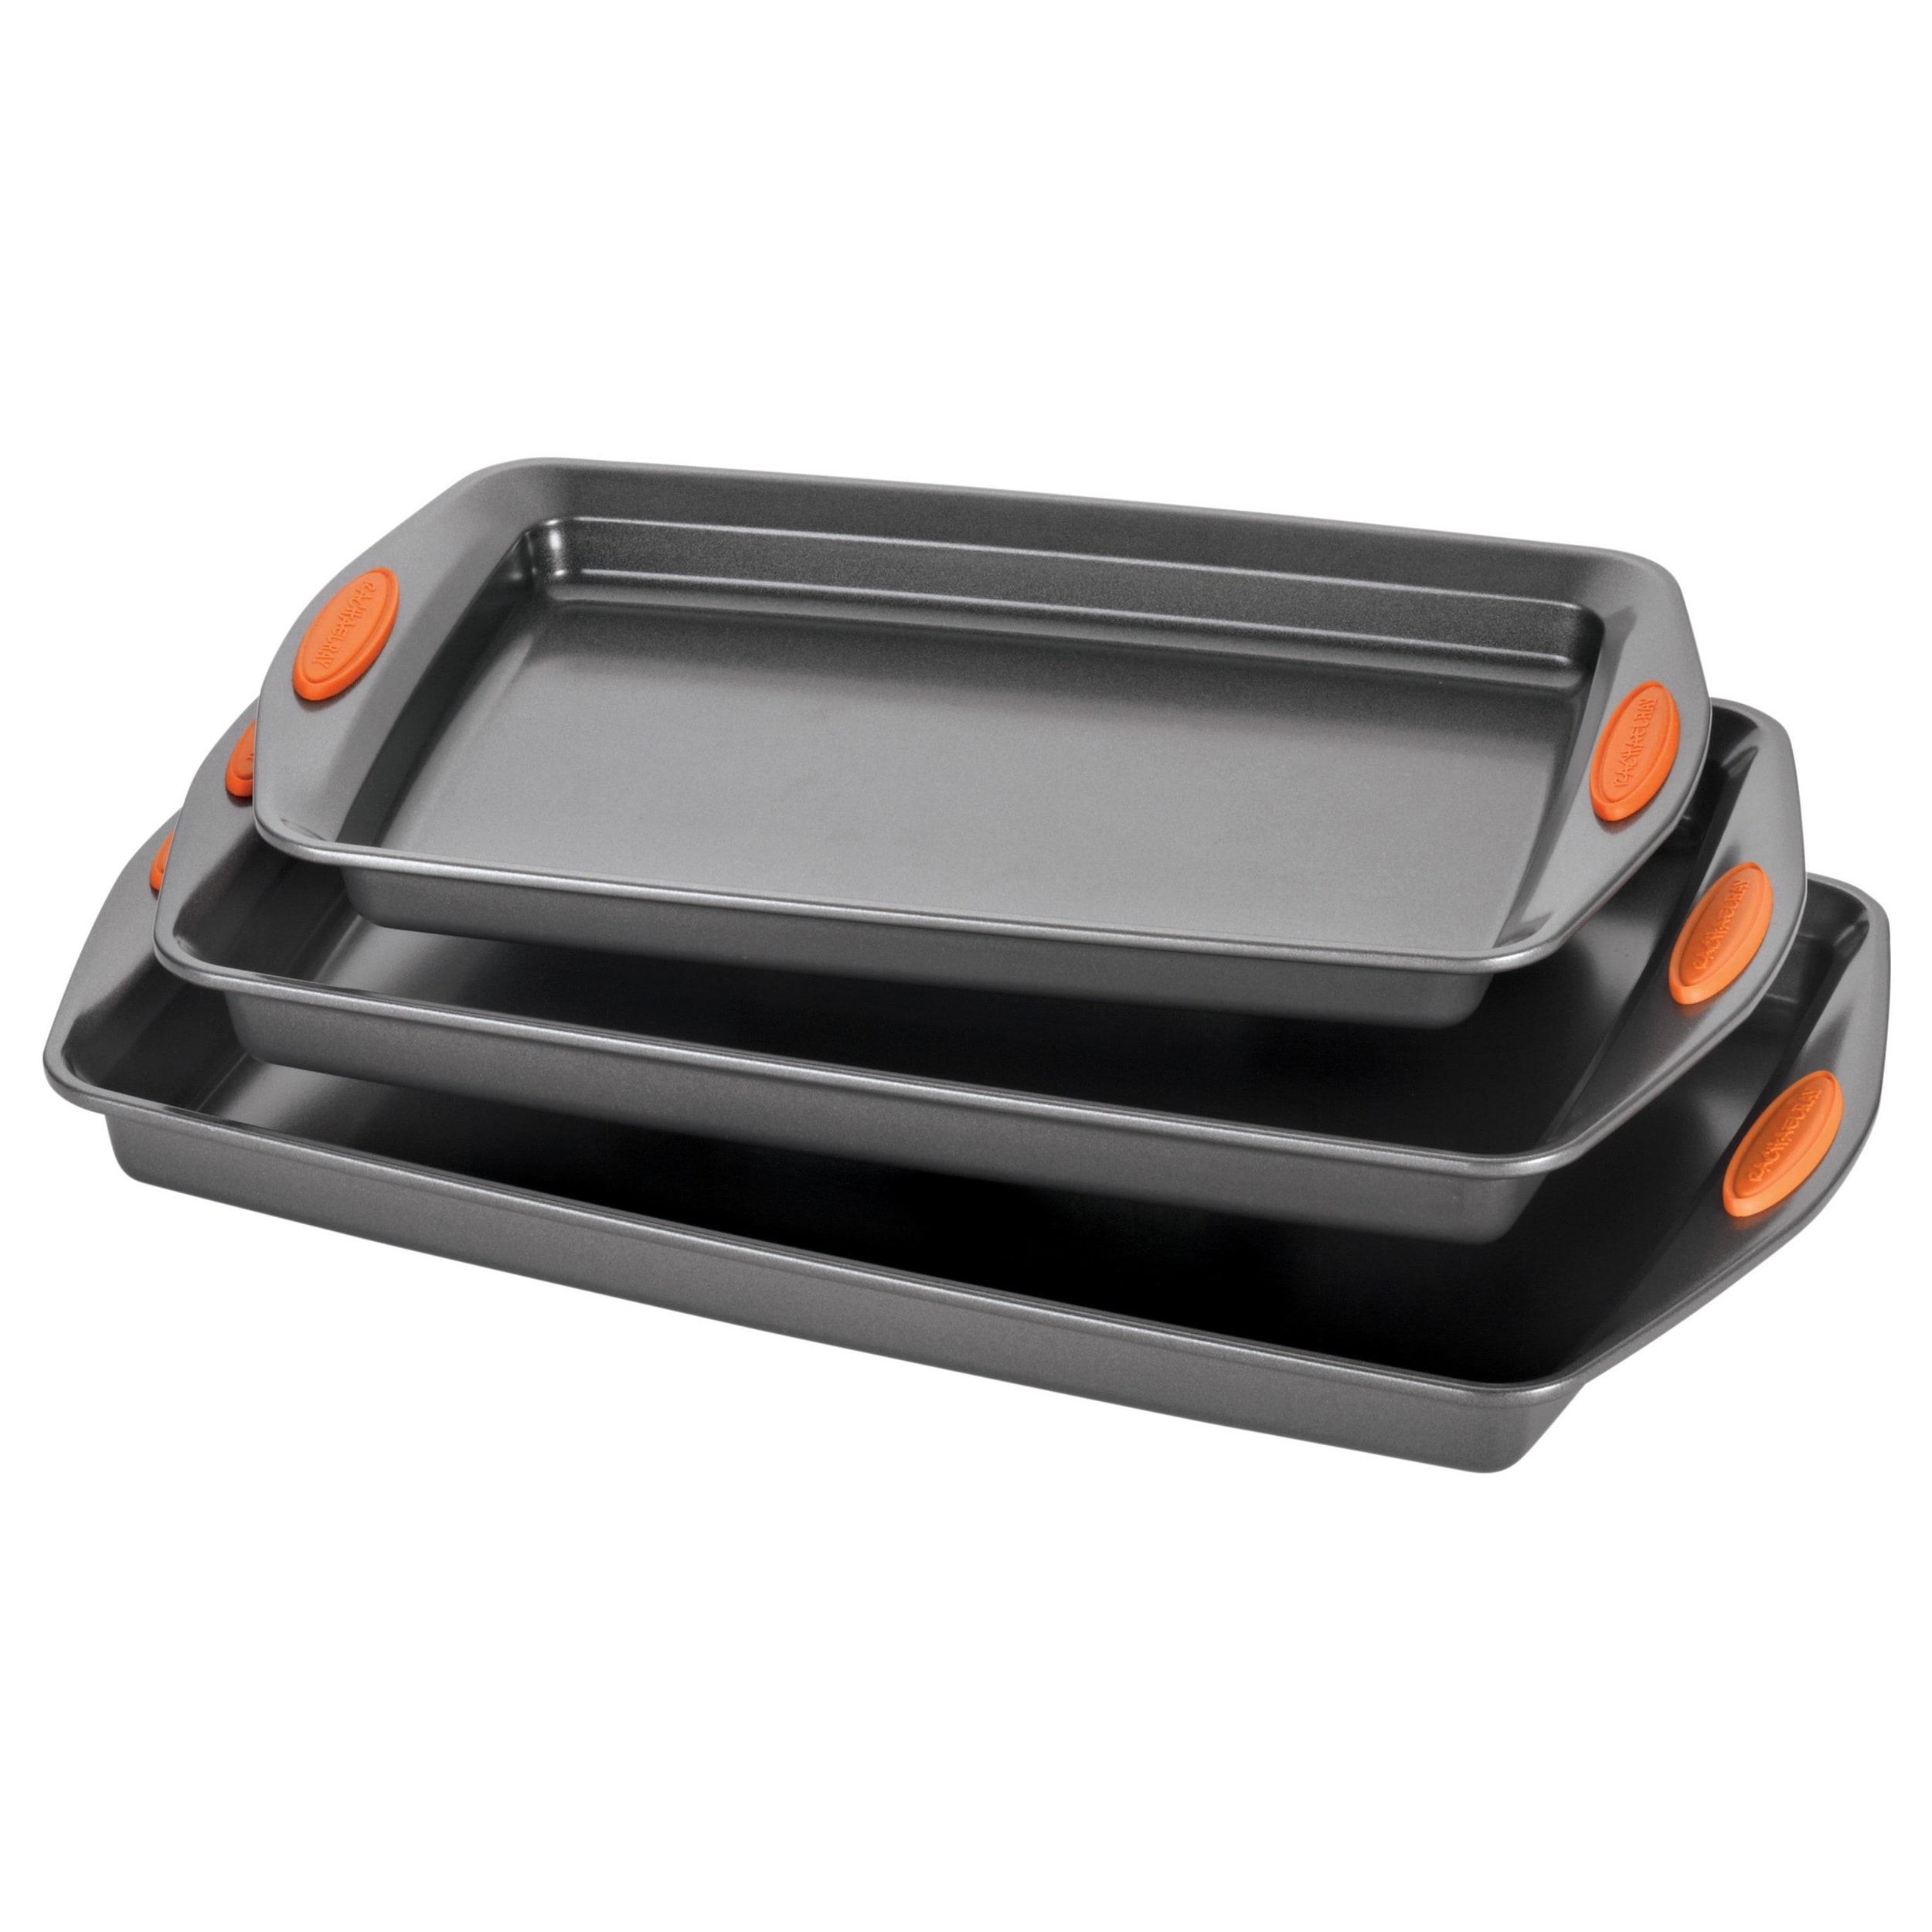 Get Goods Non Stick Oven Baking Trays Black 3 Pieces Carbon Steel Roasting Tins Pans Set